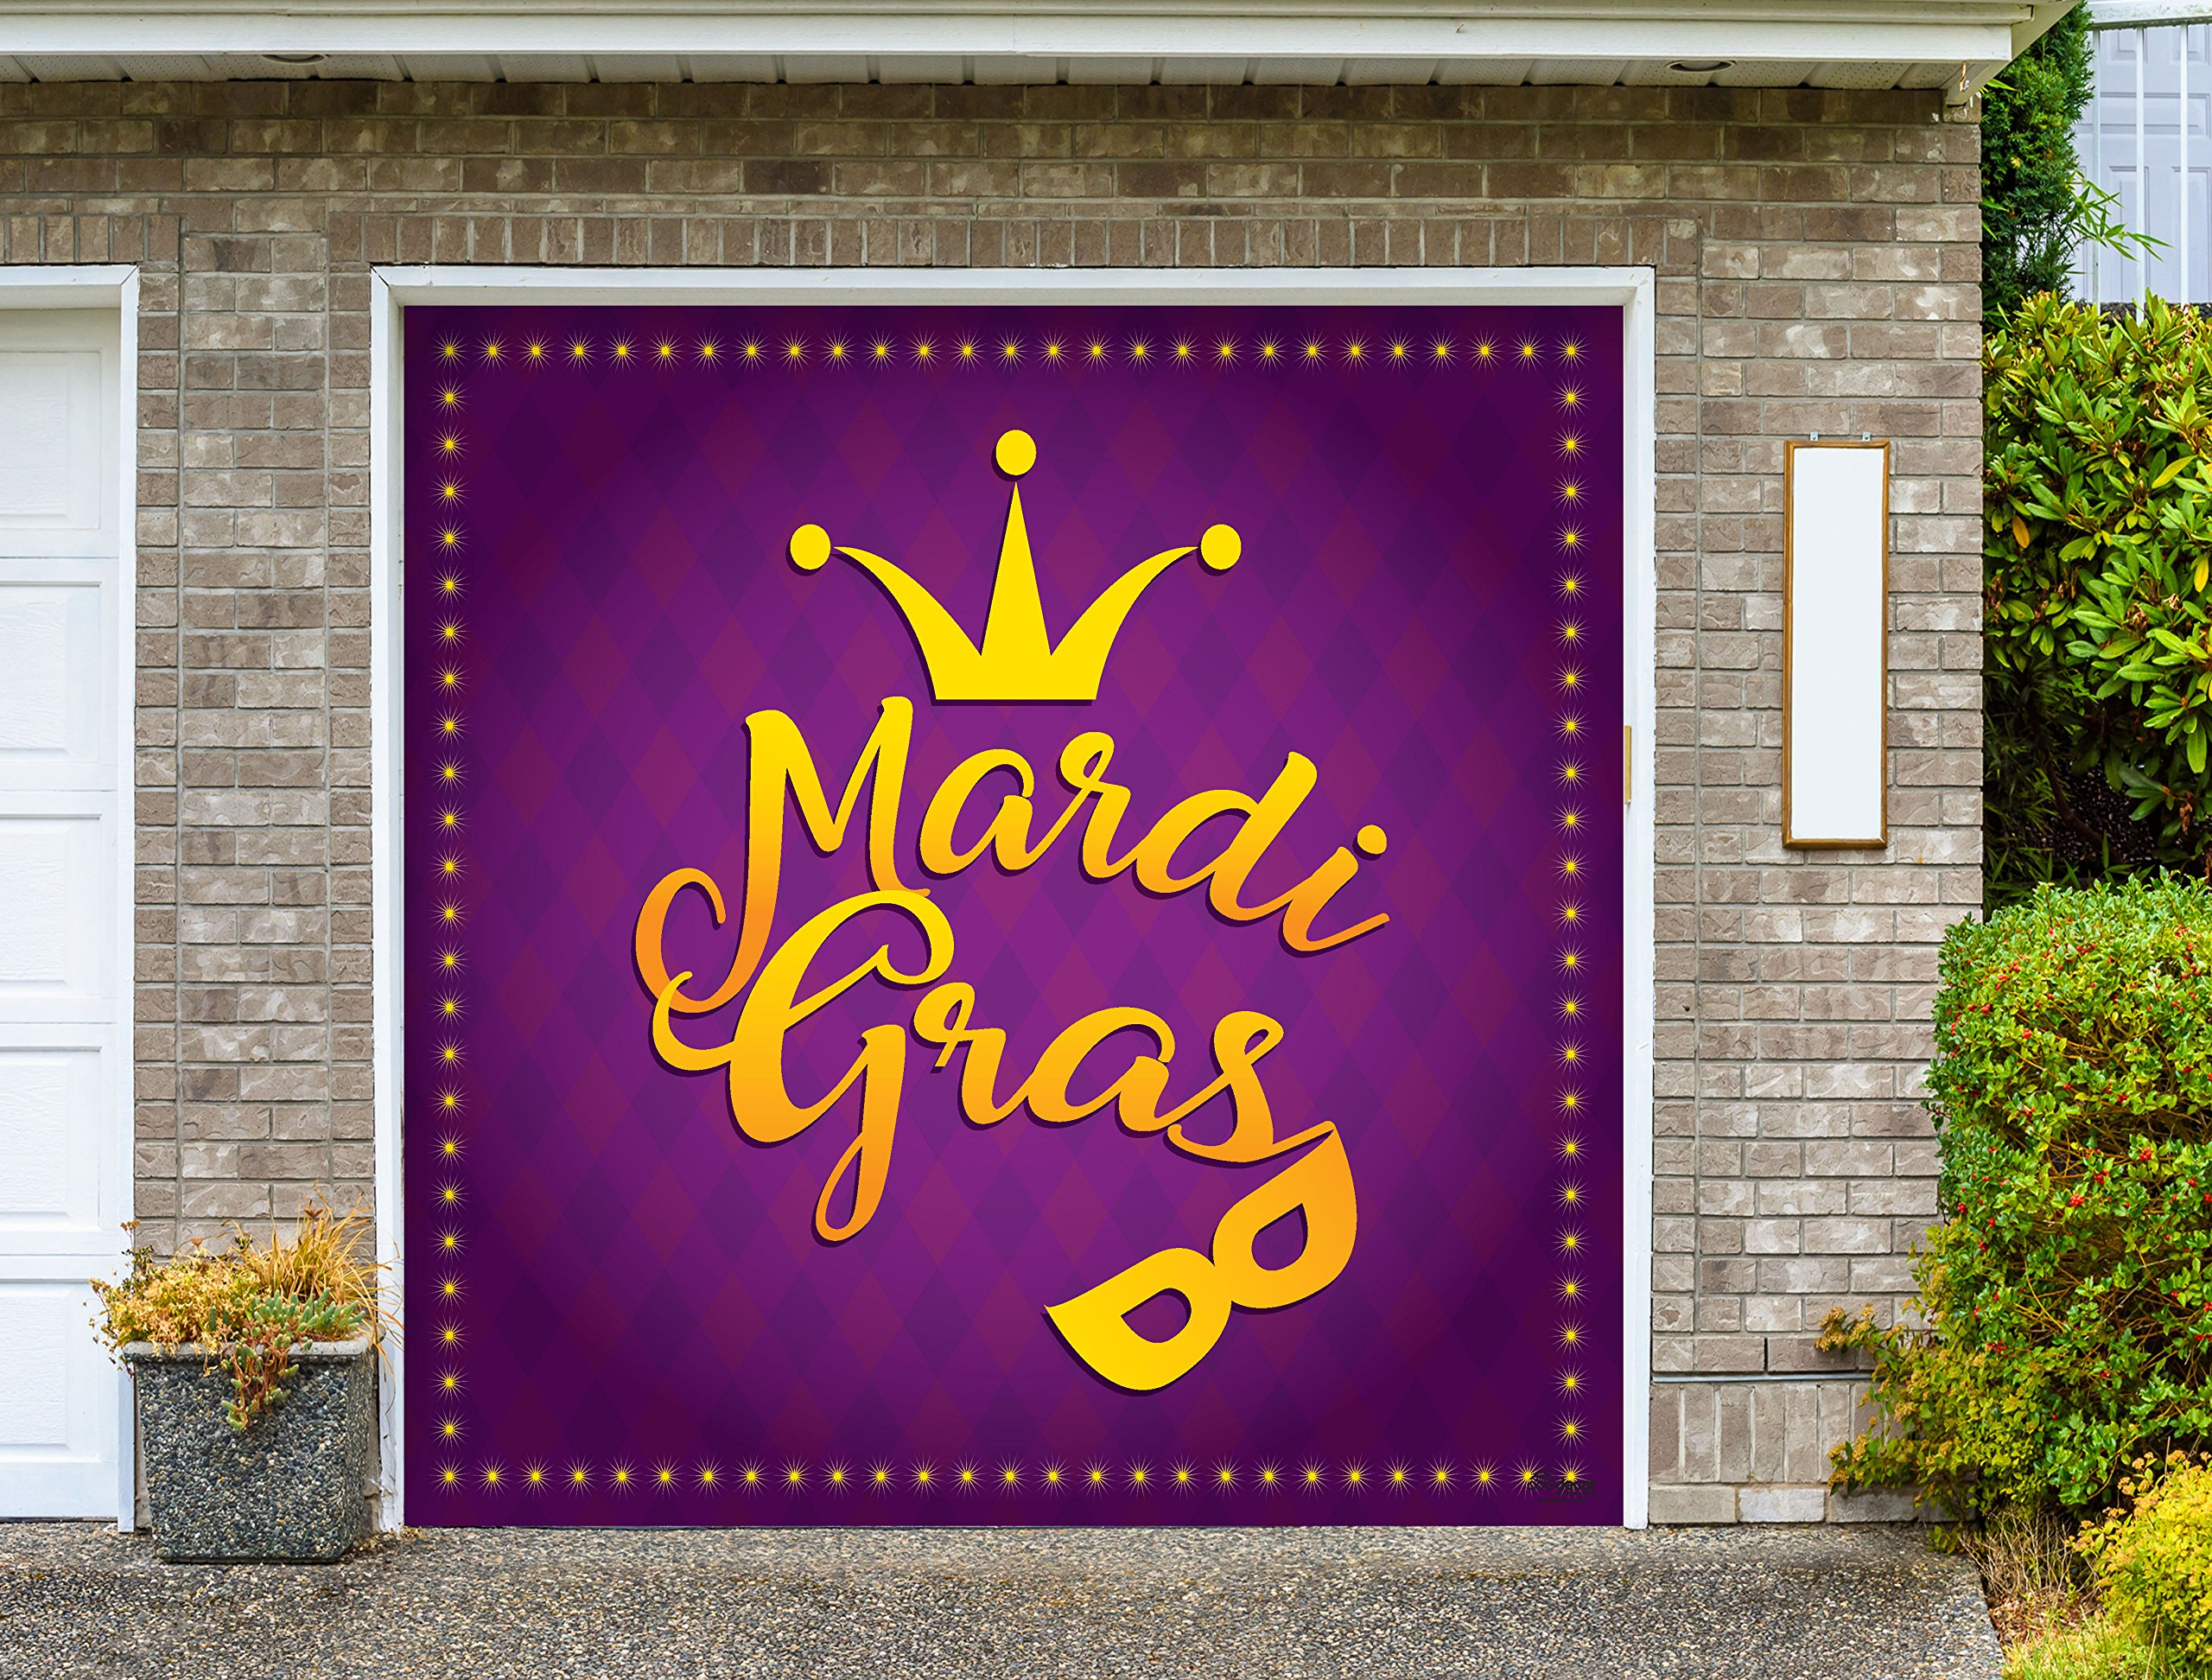 Outdoor Mardi Gras Decorations Garage Door Banner Cover Mural Décoration 8'x8' - Mardi Gras Crown and Mask - ''The Original Mardi Gras Supplies Holiday Garage Door Banner Decor''